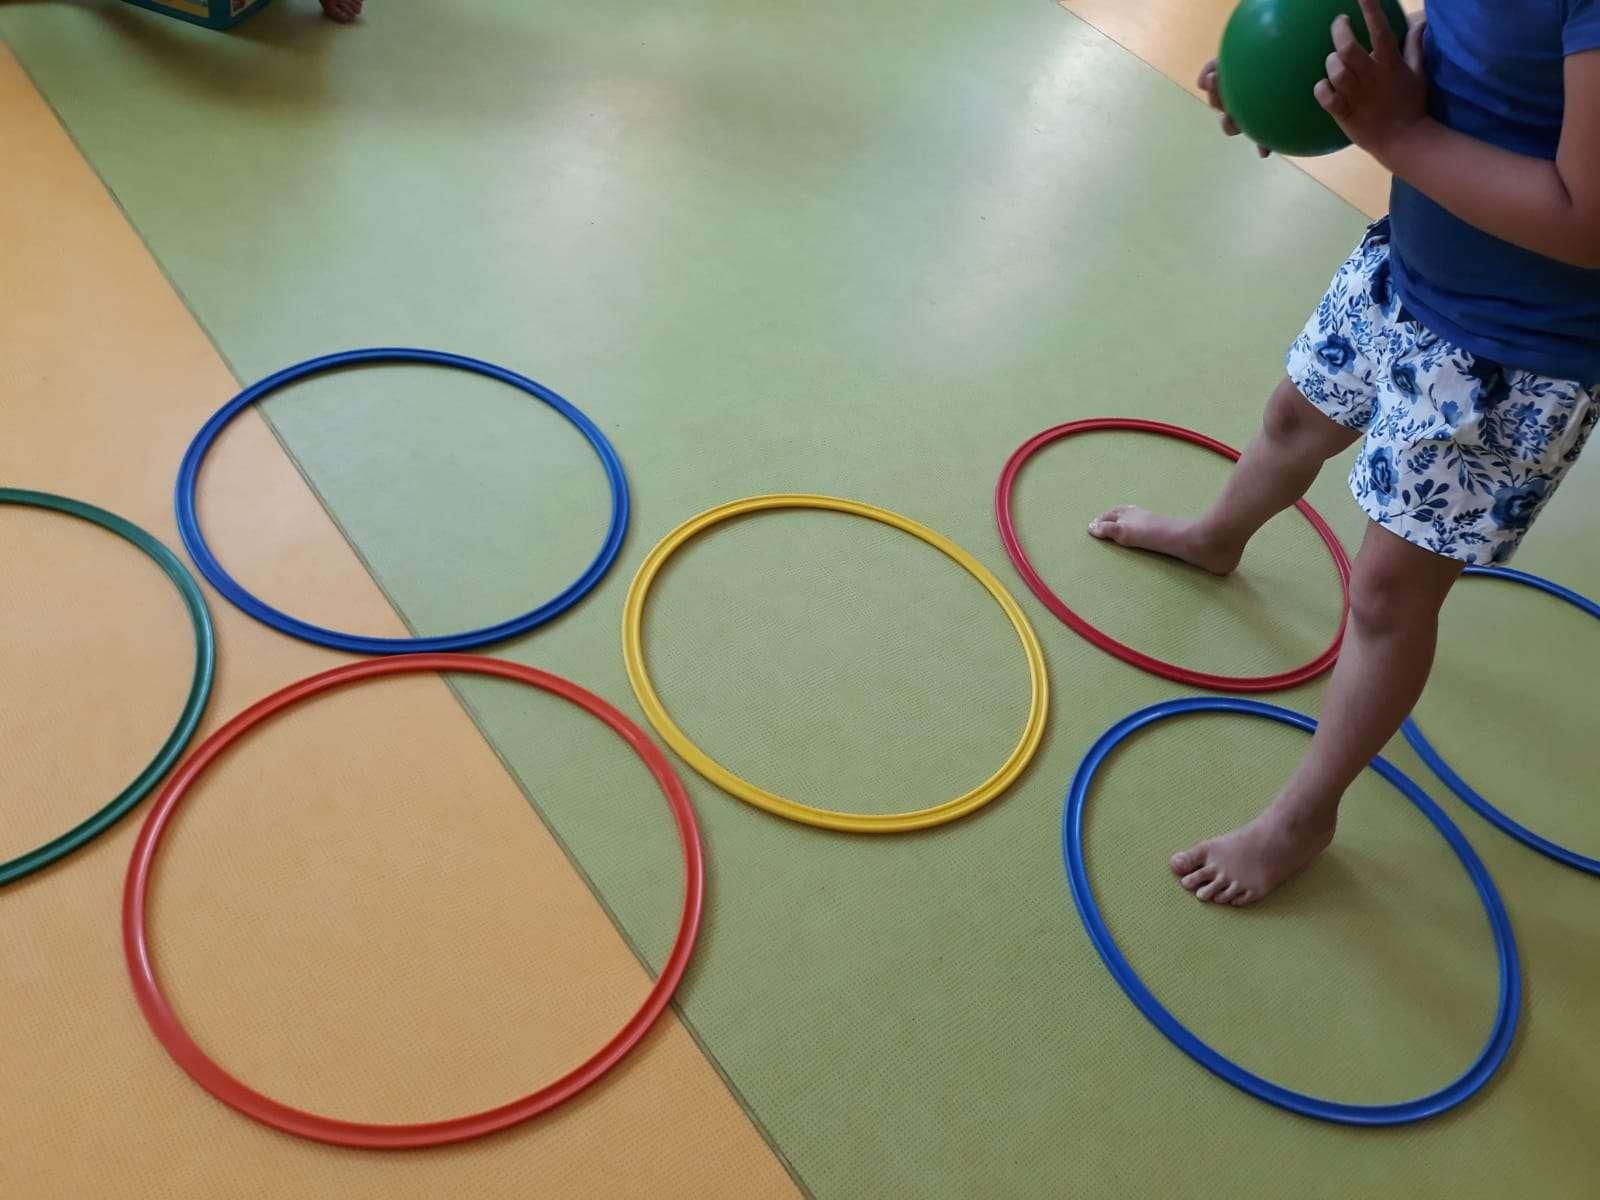 IMG 20190803 WA0034 - Scuola Materna Peschiera Borromeo